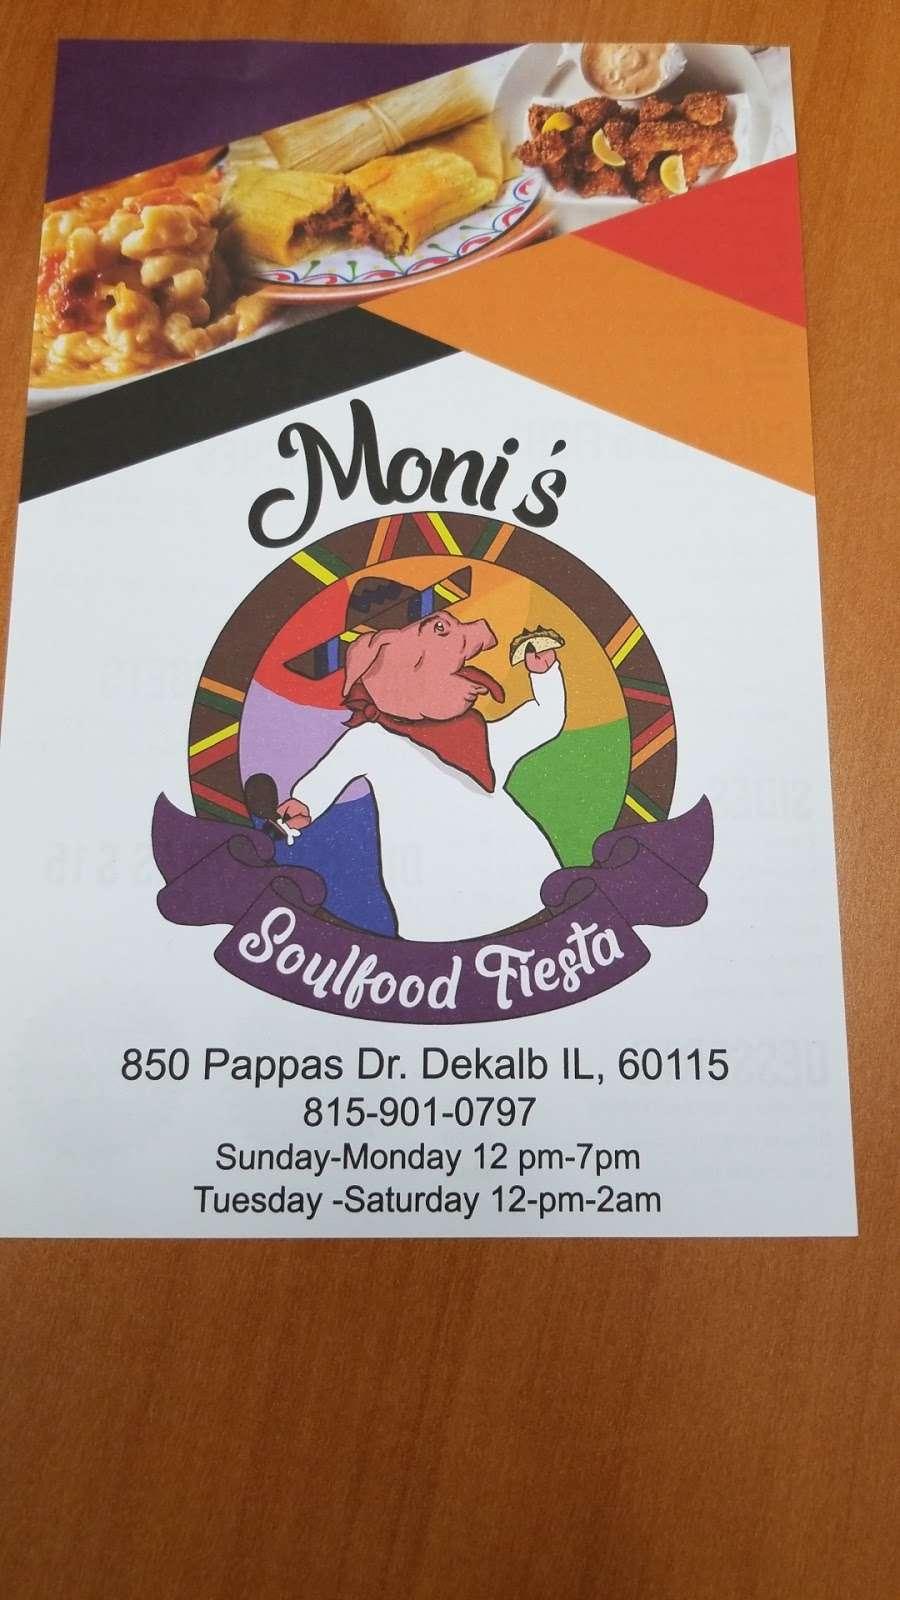 Monis Soulfood Fiesta - restaurant    Photo 7 of 7   Address: 850 Pappas Dr, DeKalb, IL 60115, USA   Phone: (815) 901-0797